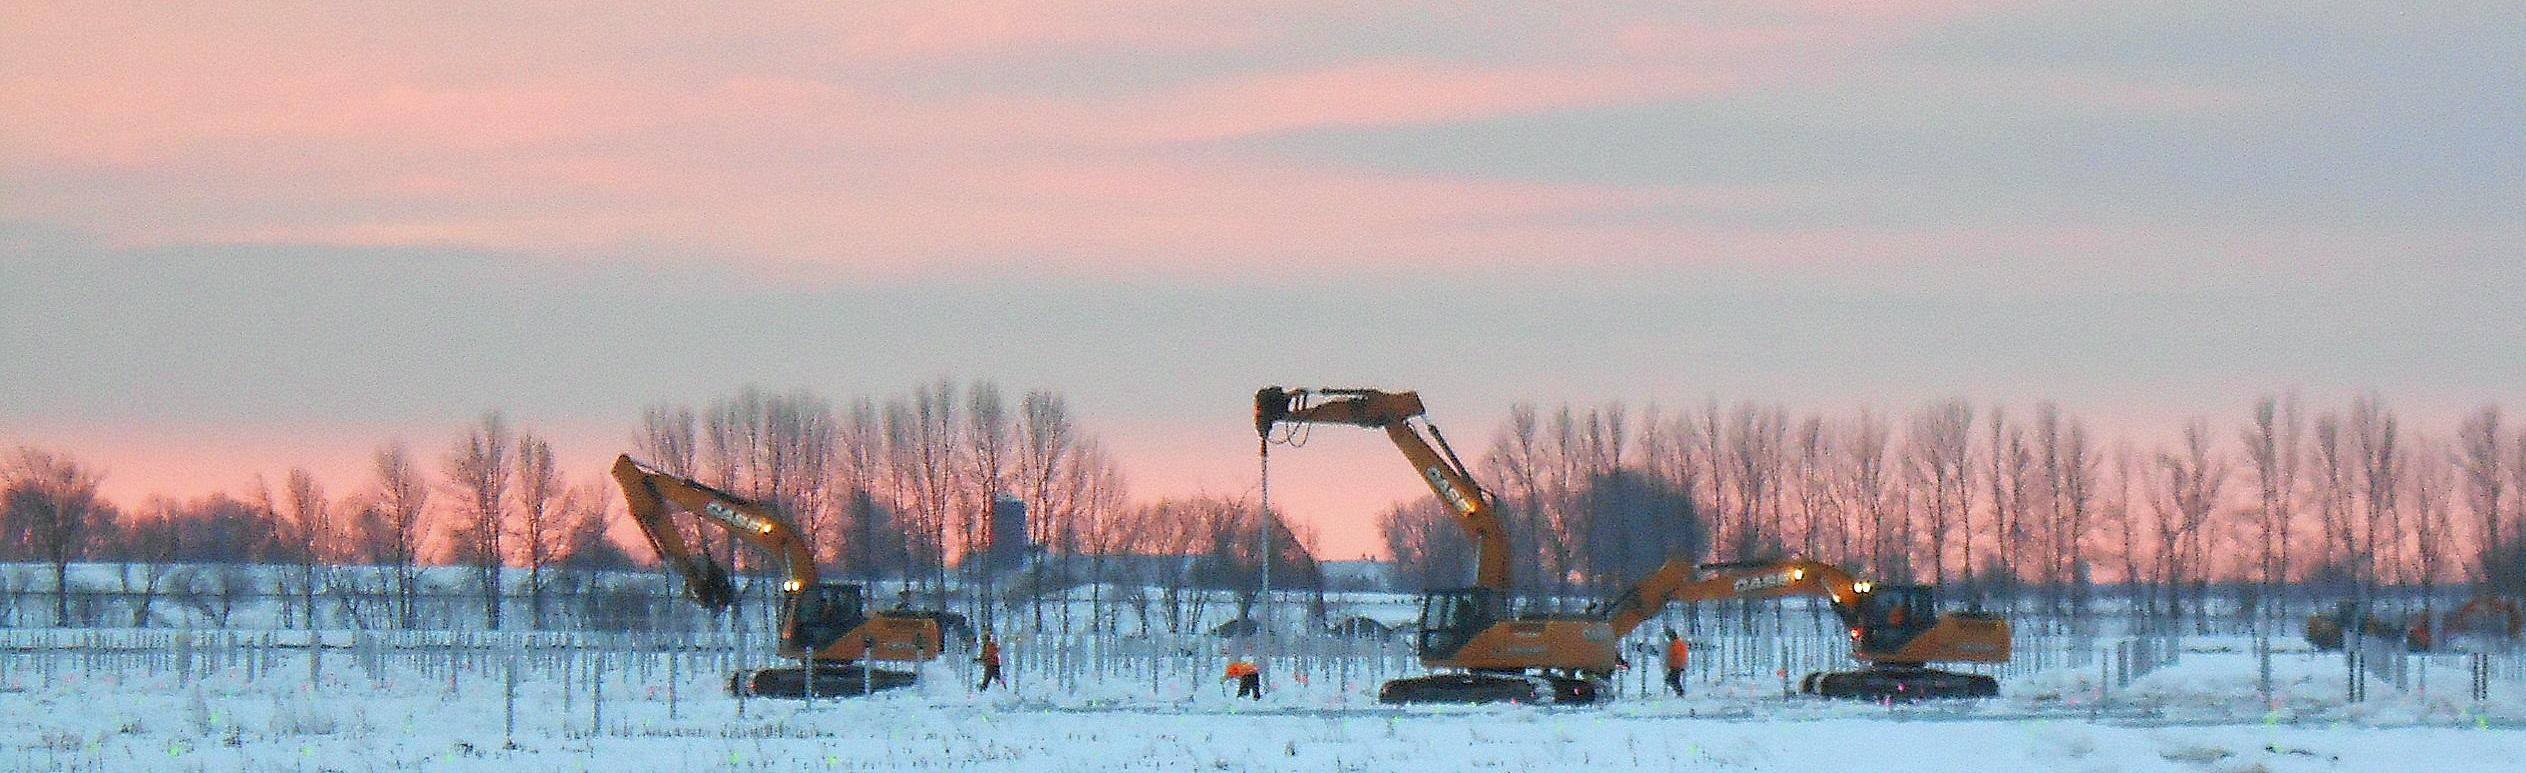 SSCI MS excavator pic